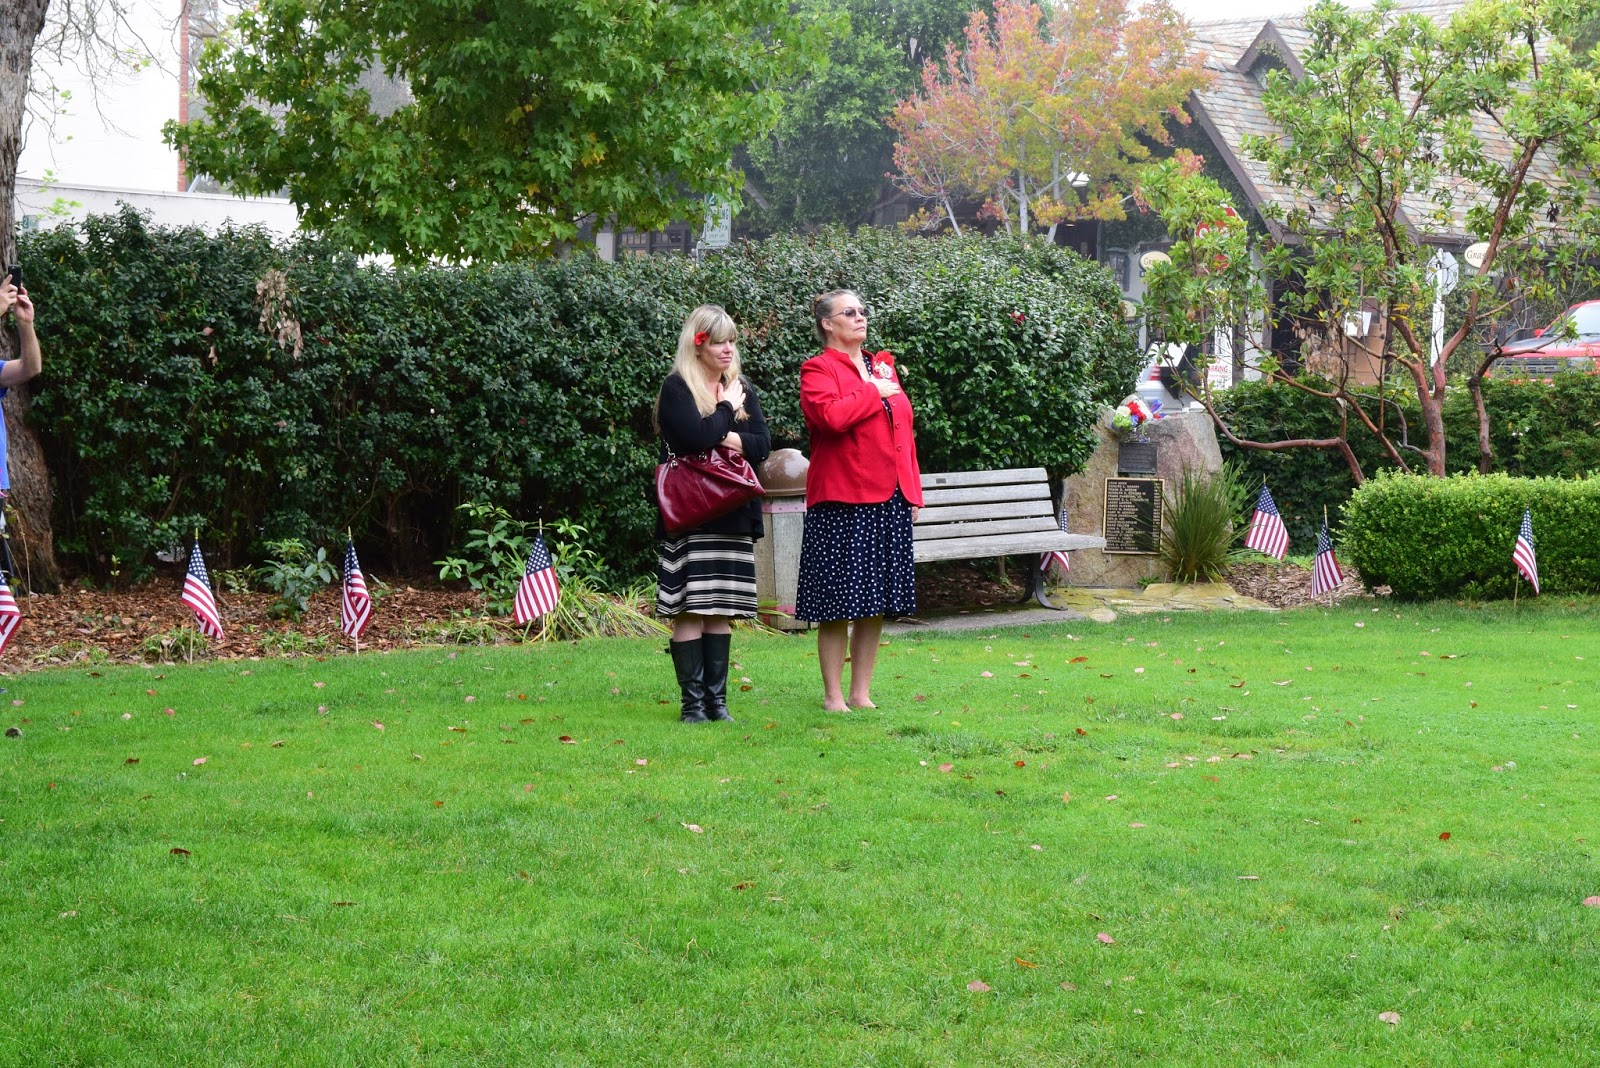 veterans day november 11 2016 dedication of the war memorial